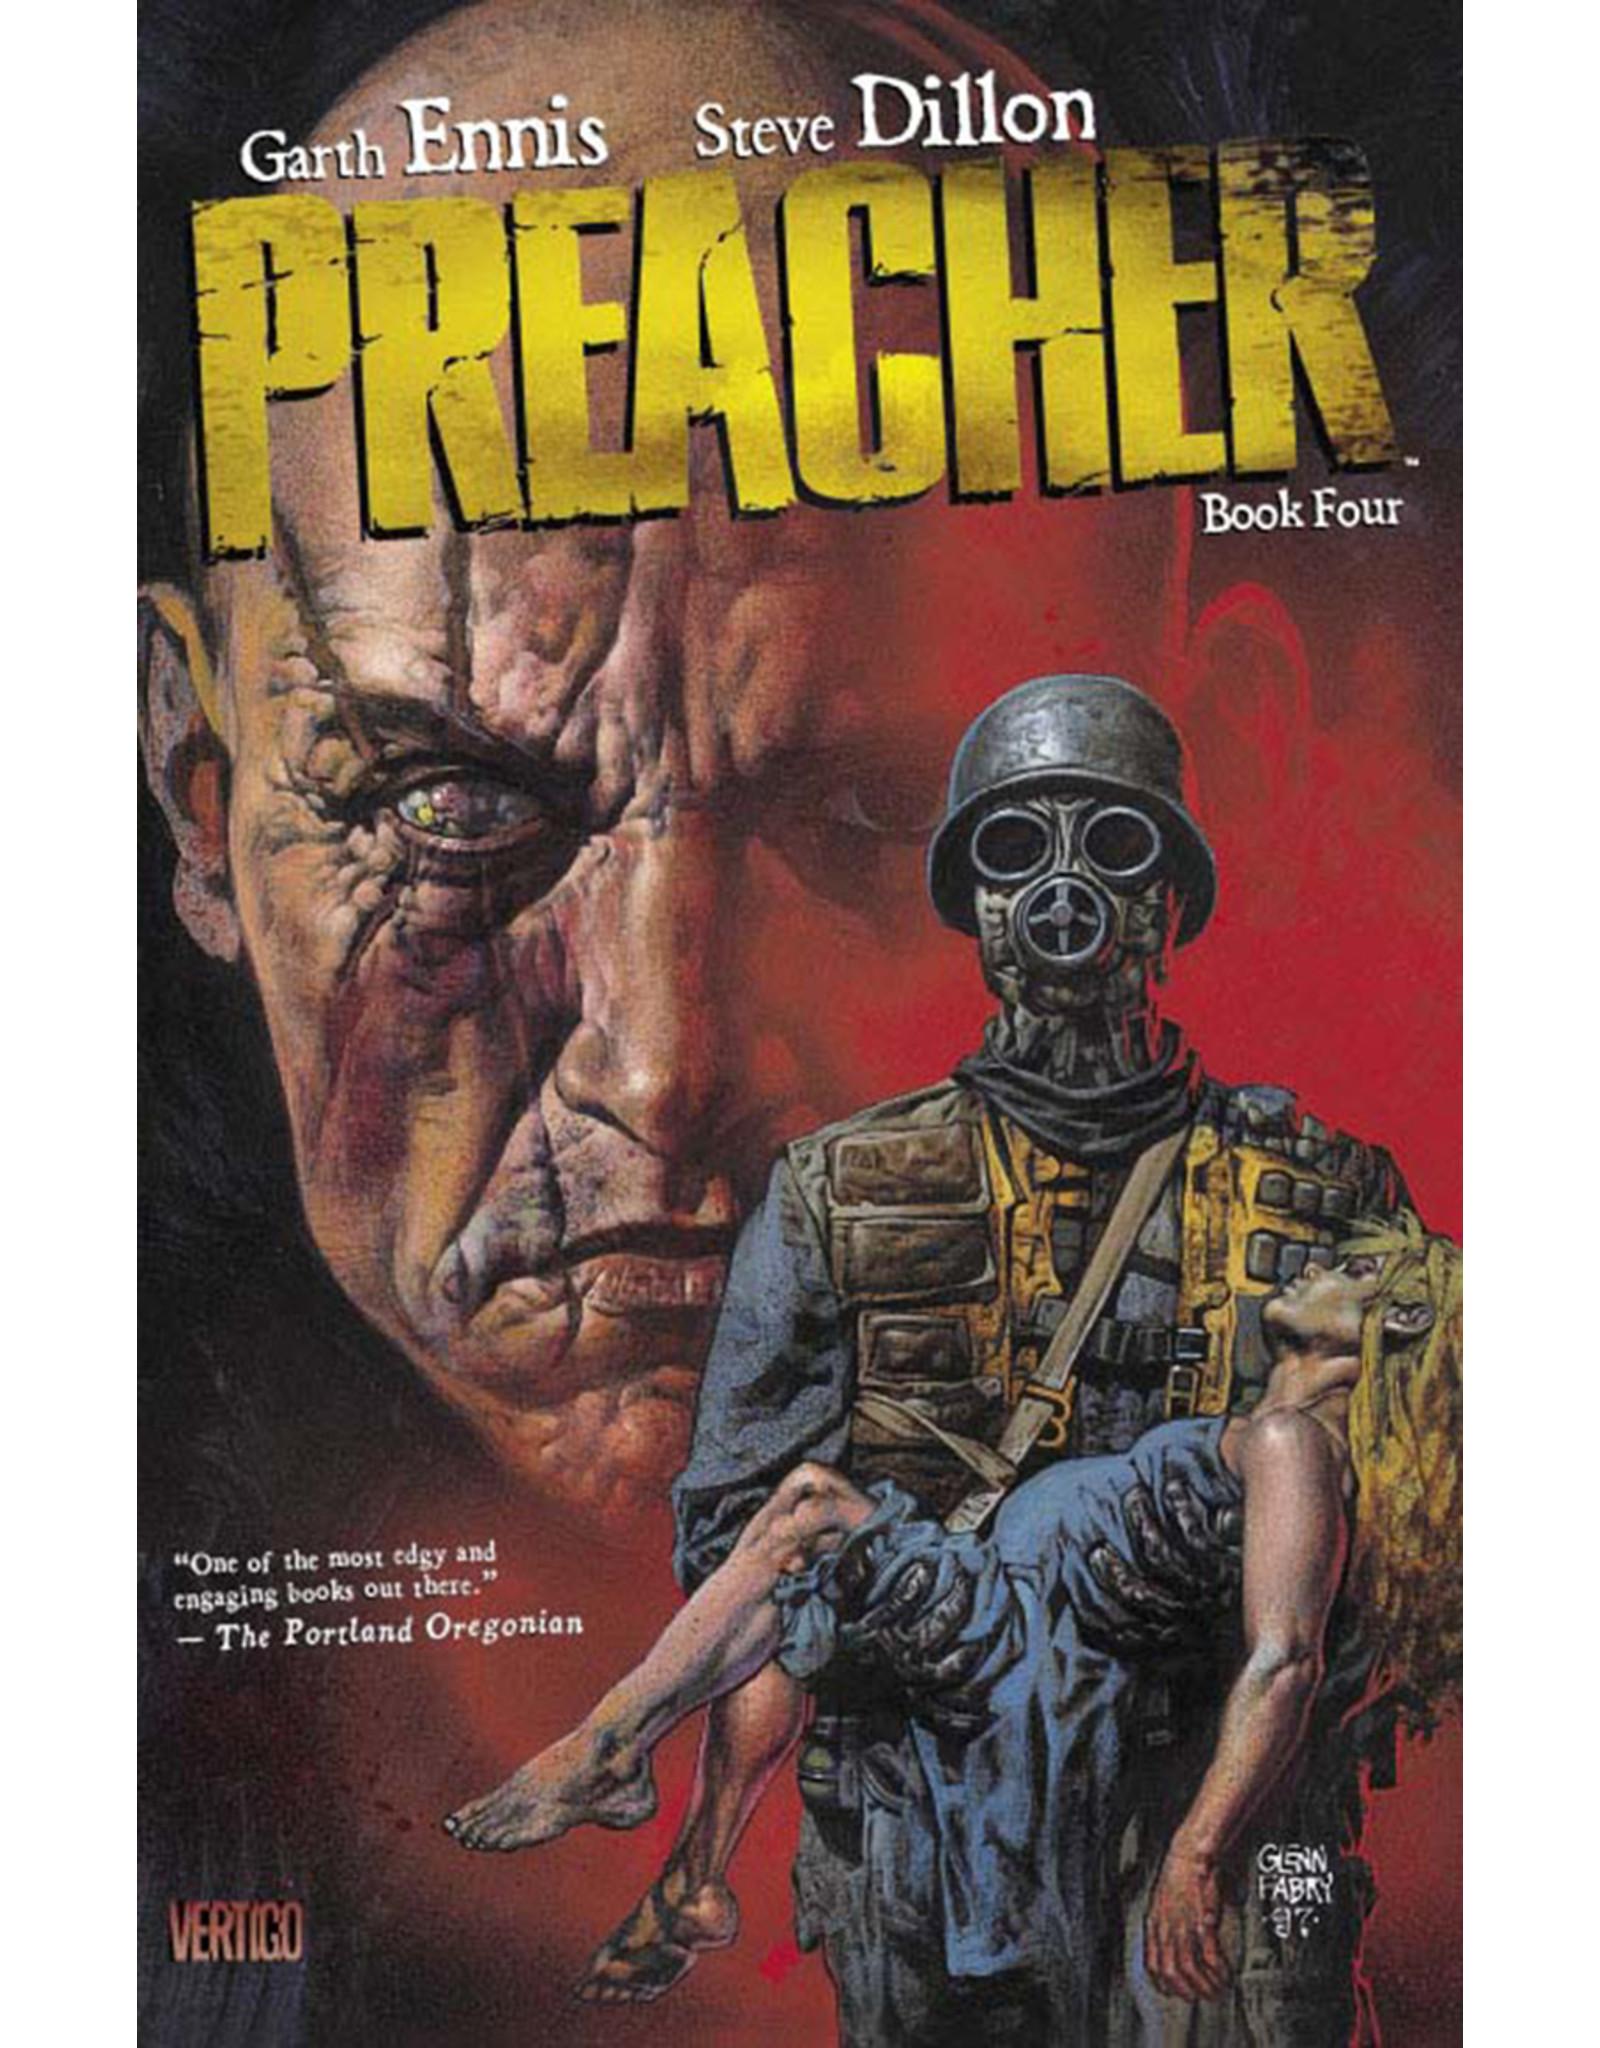 DC COMICS PREACHER TP BOOK 04